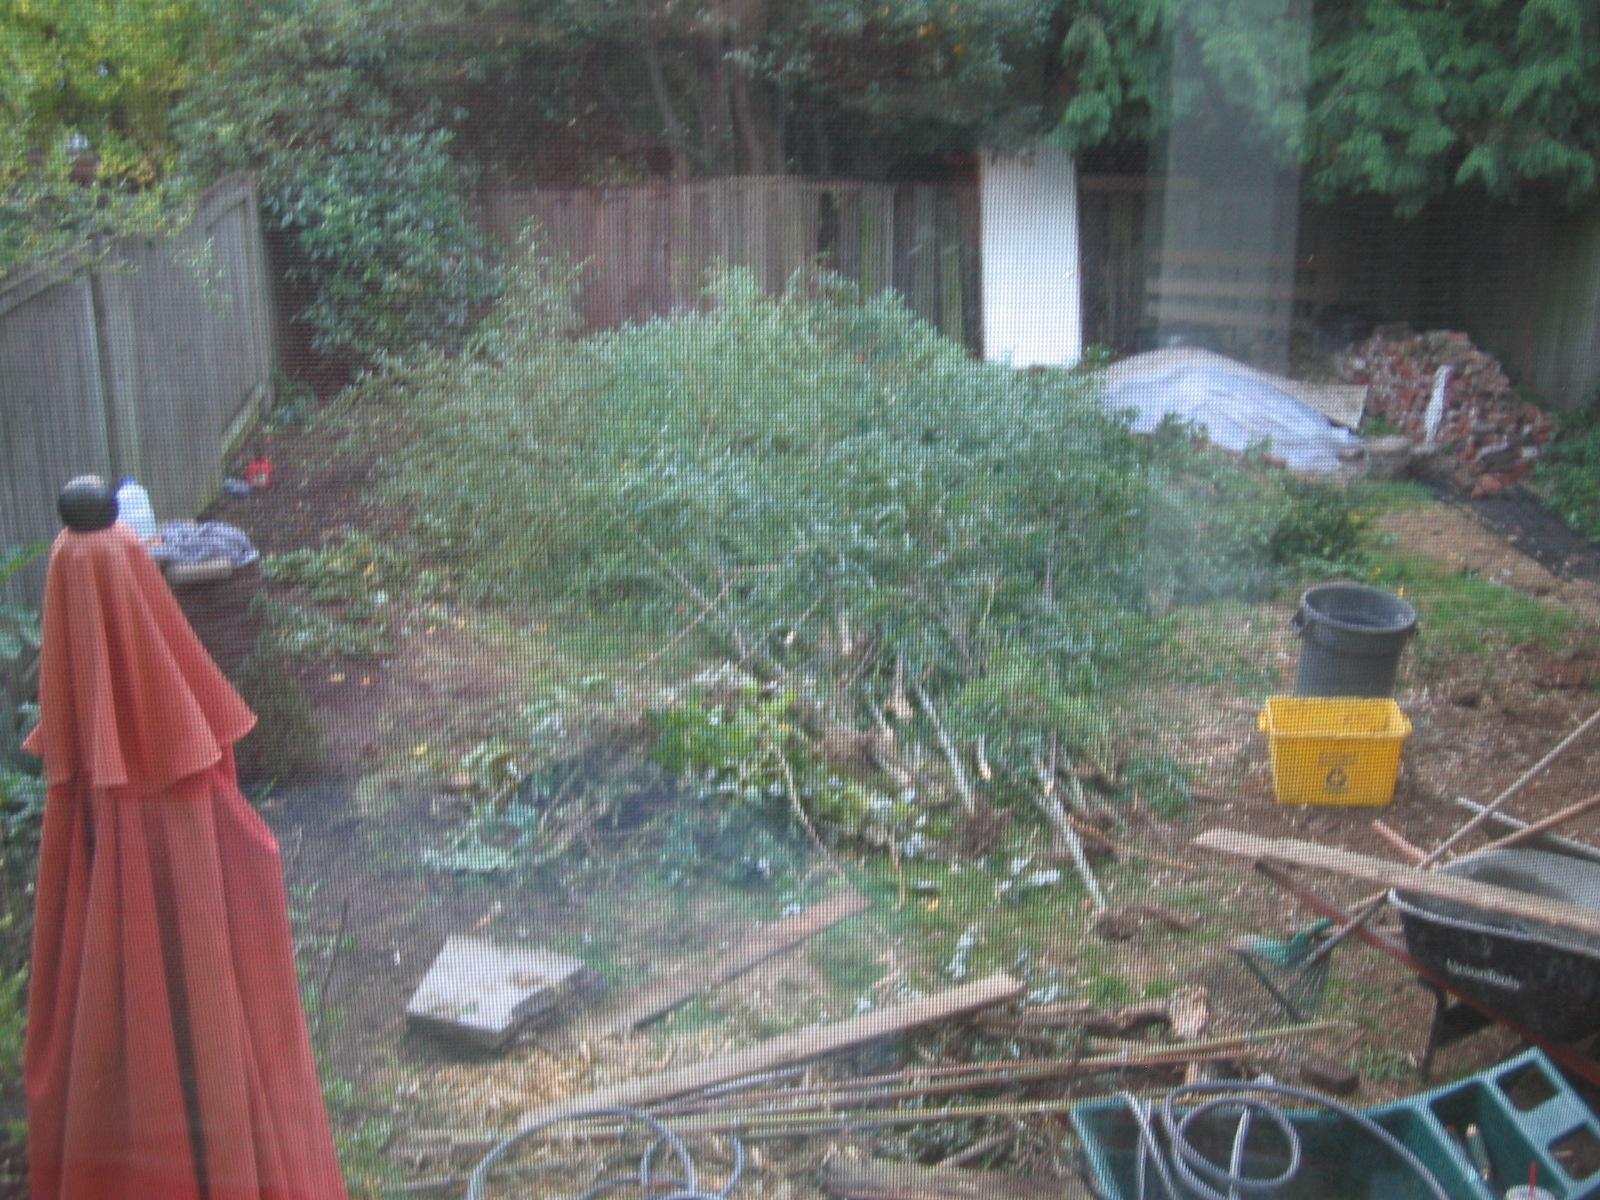 consruction debris in backyard